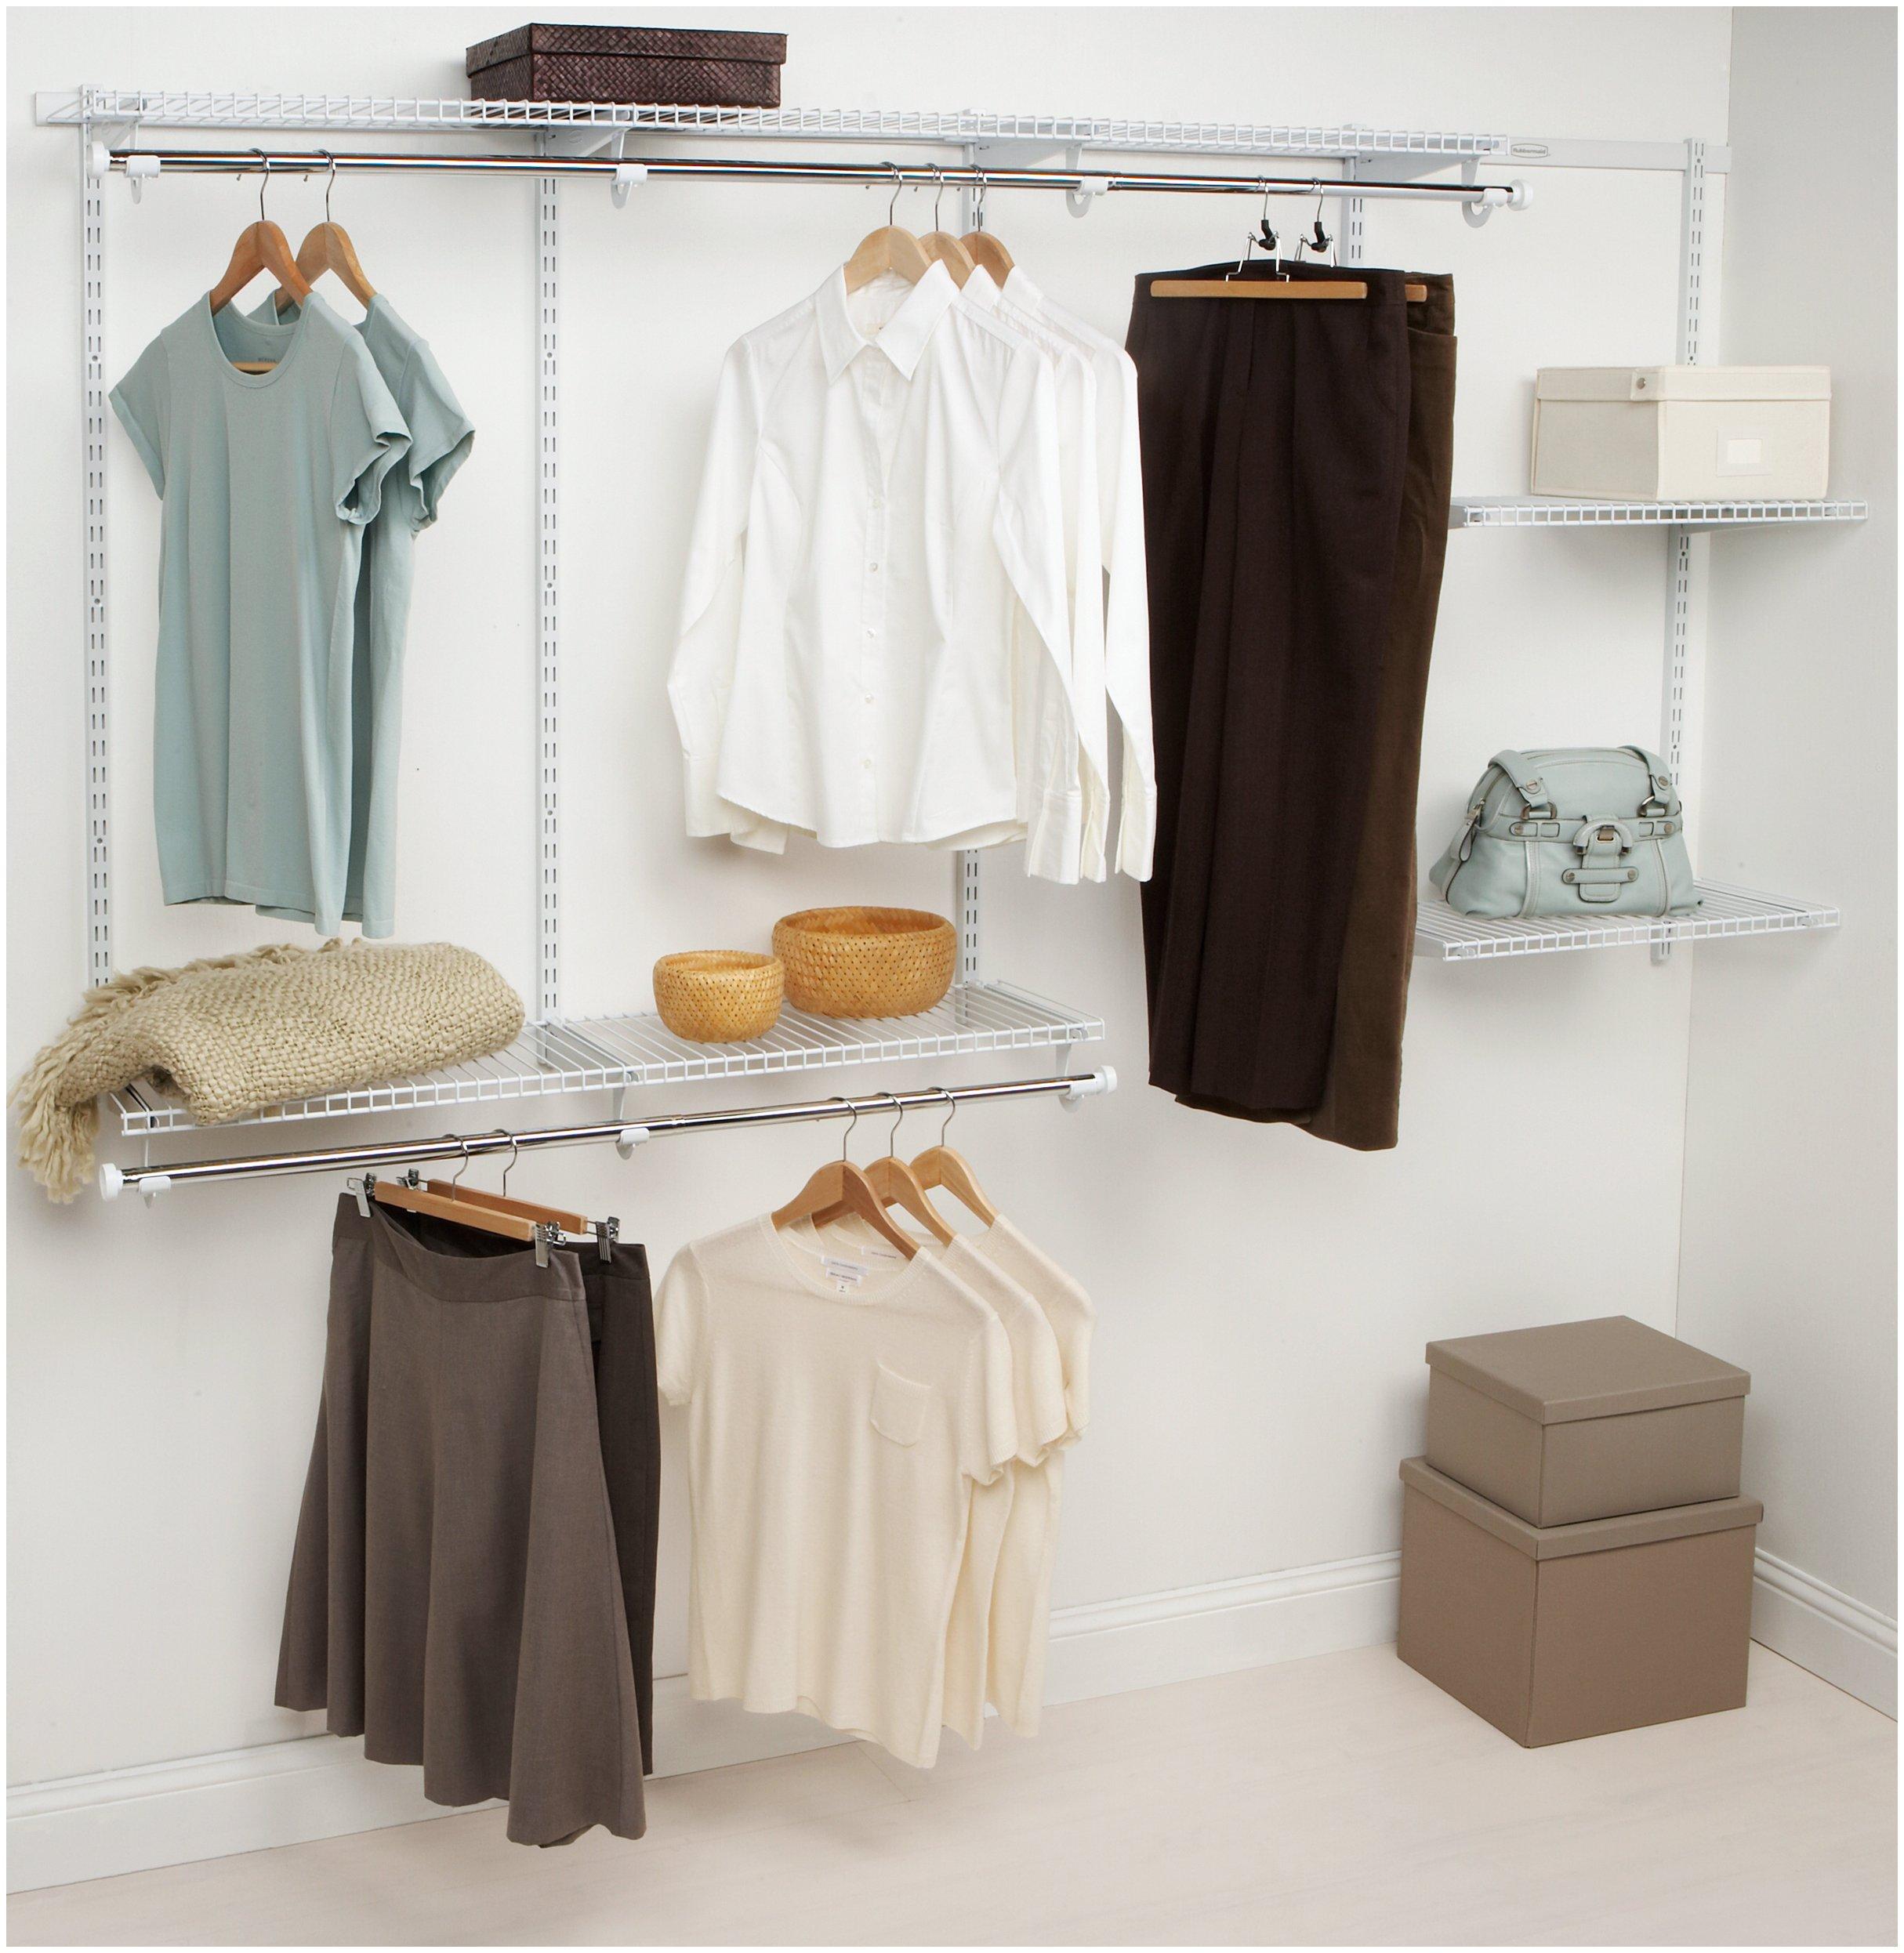 Cheap Rubbermaid Closet Kits Find Rubbermaid Closet Kits